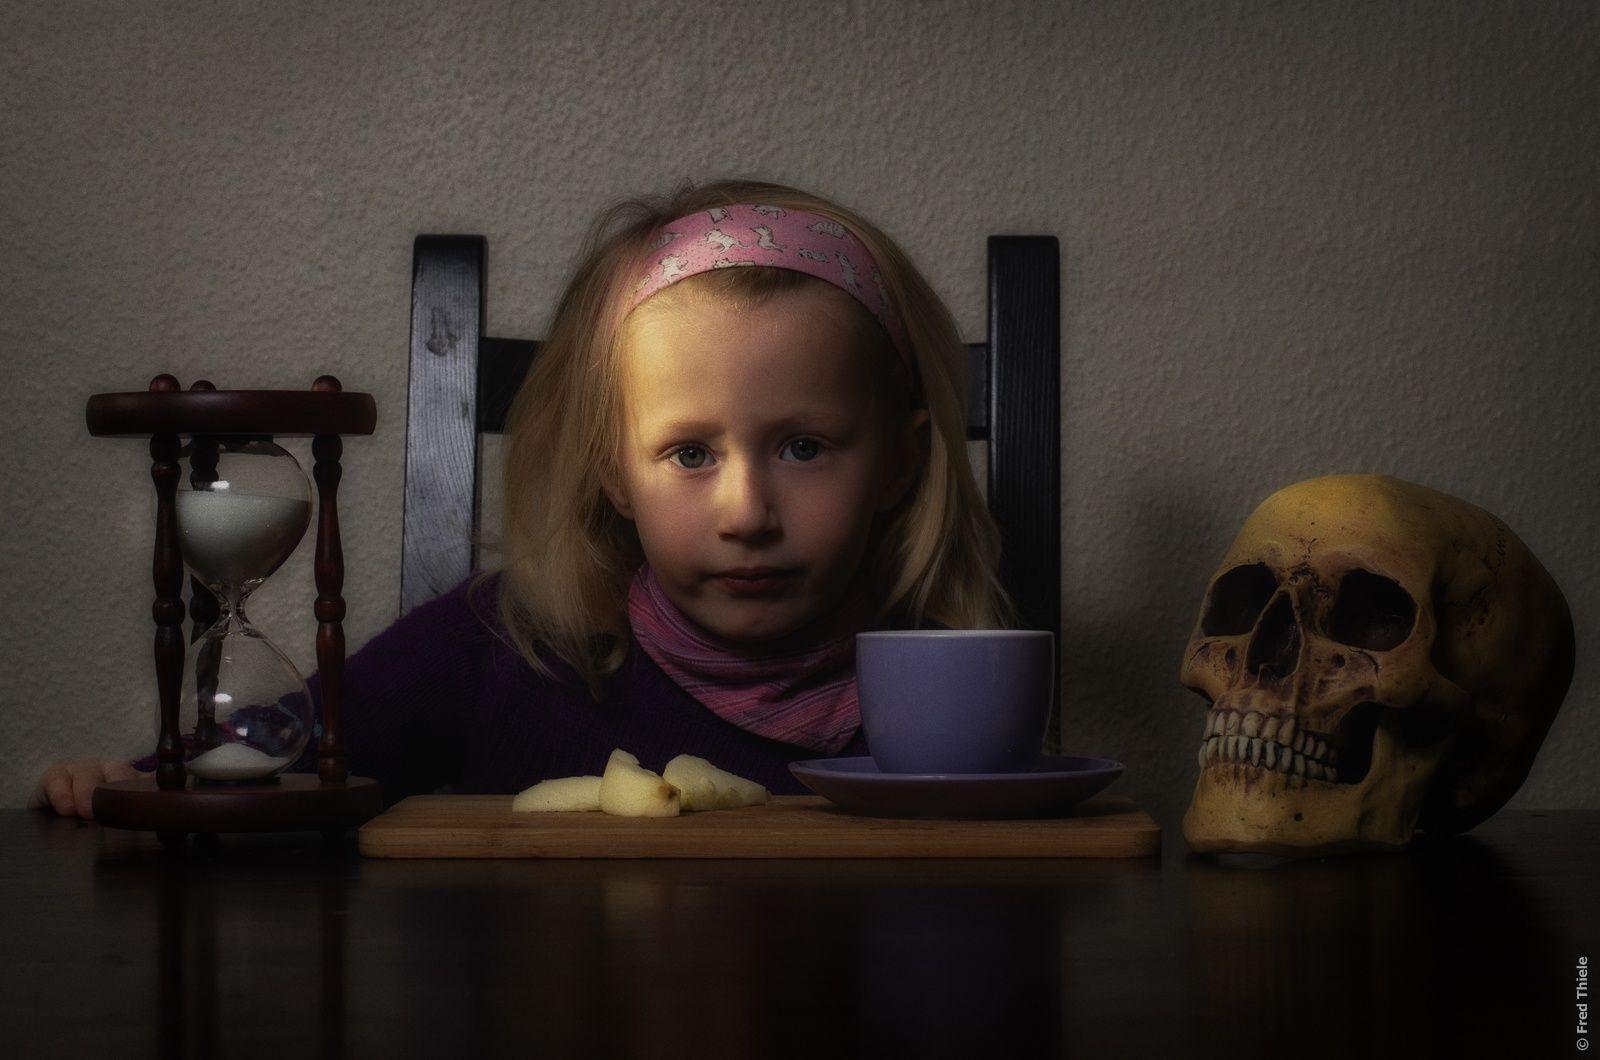 vanitas symbols w/ child portrait (colored version) by Fred Thiele on 500px